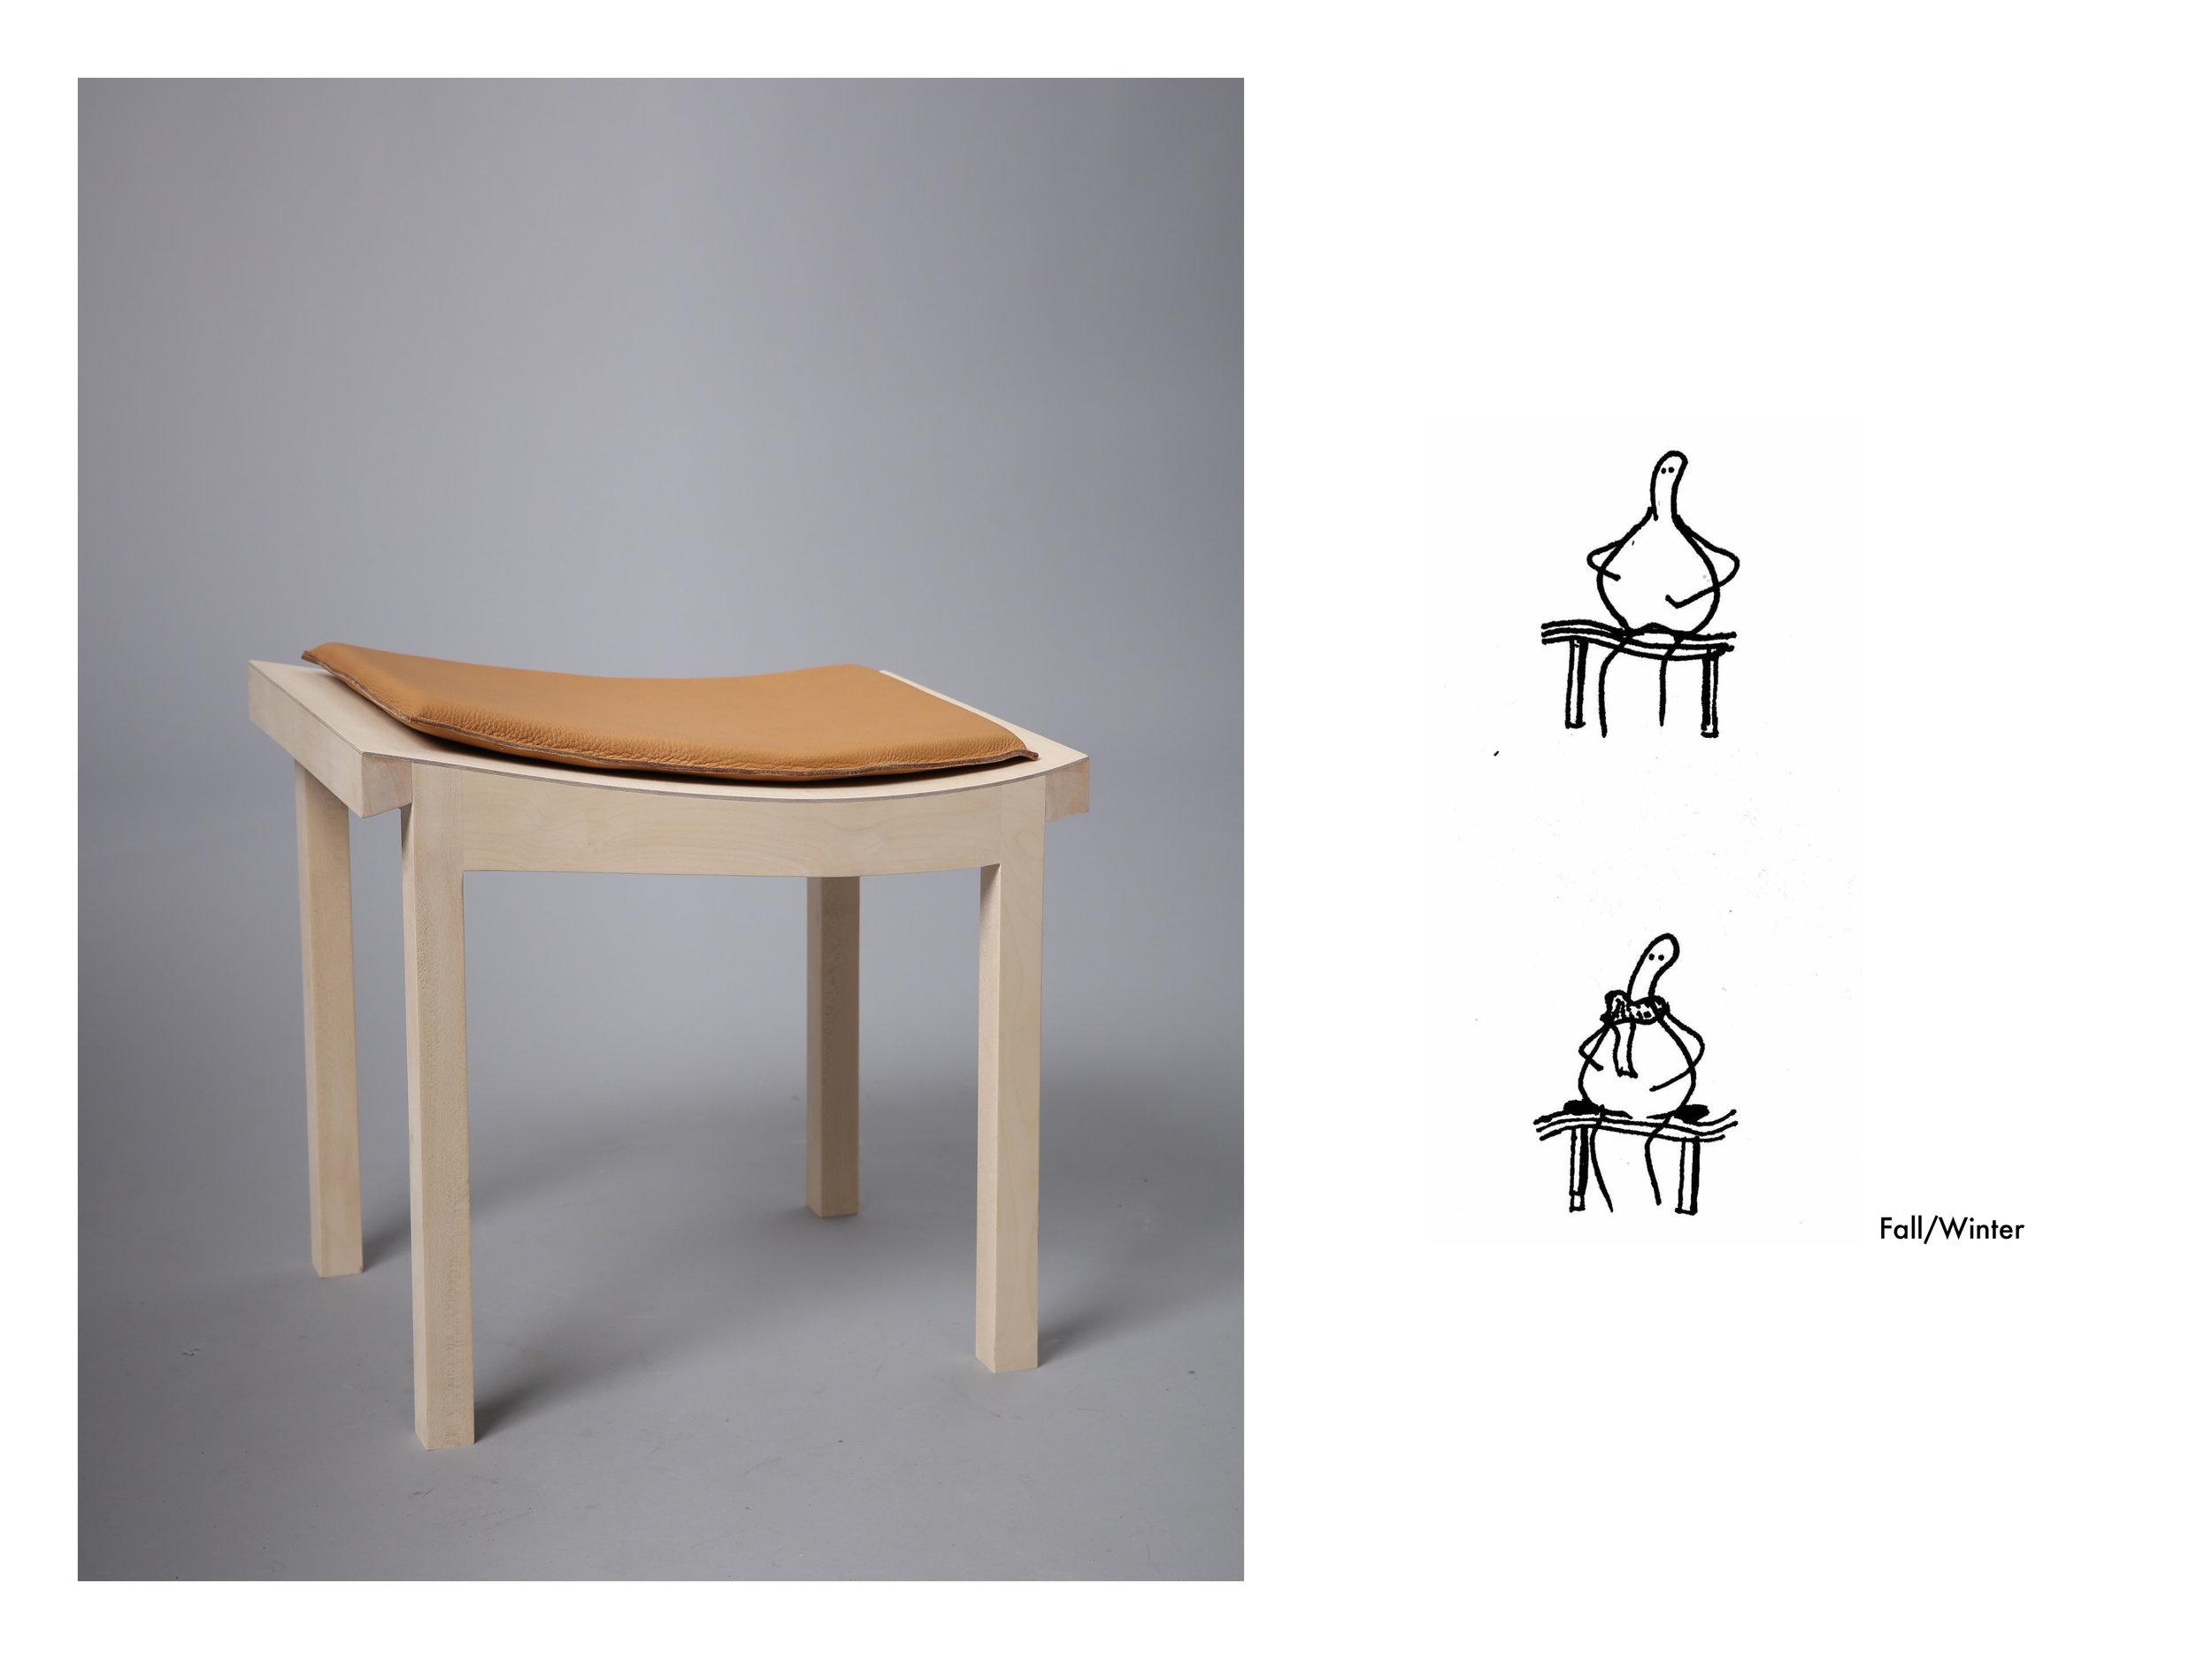 th stool5.jpg